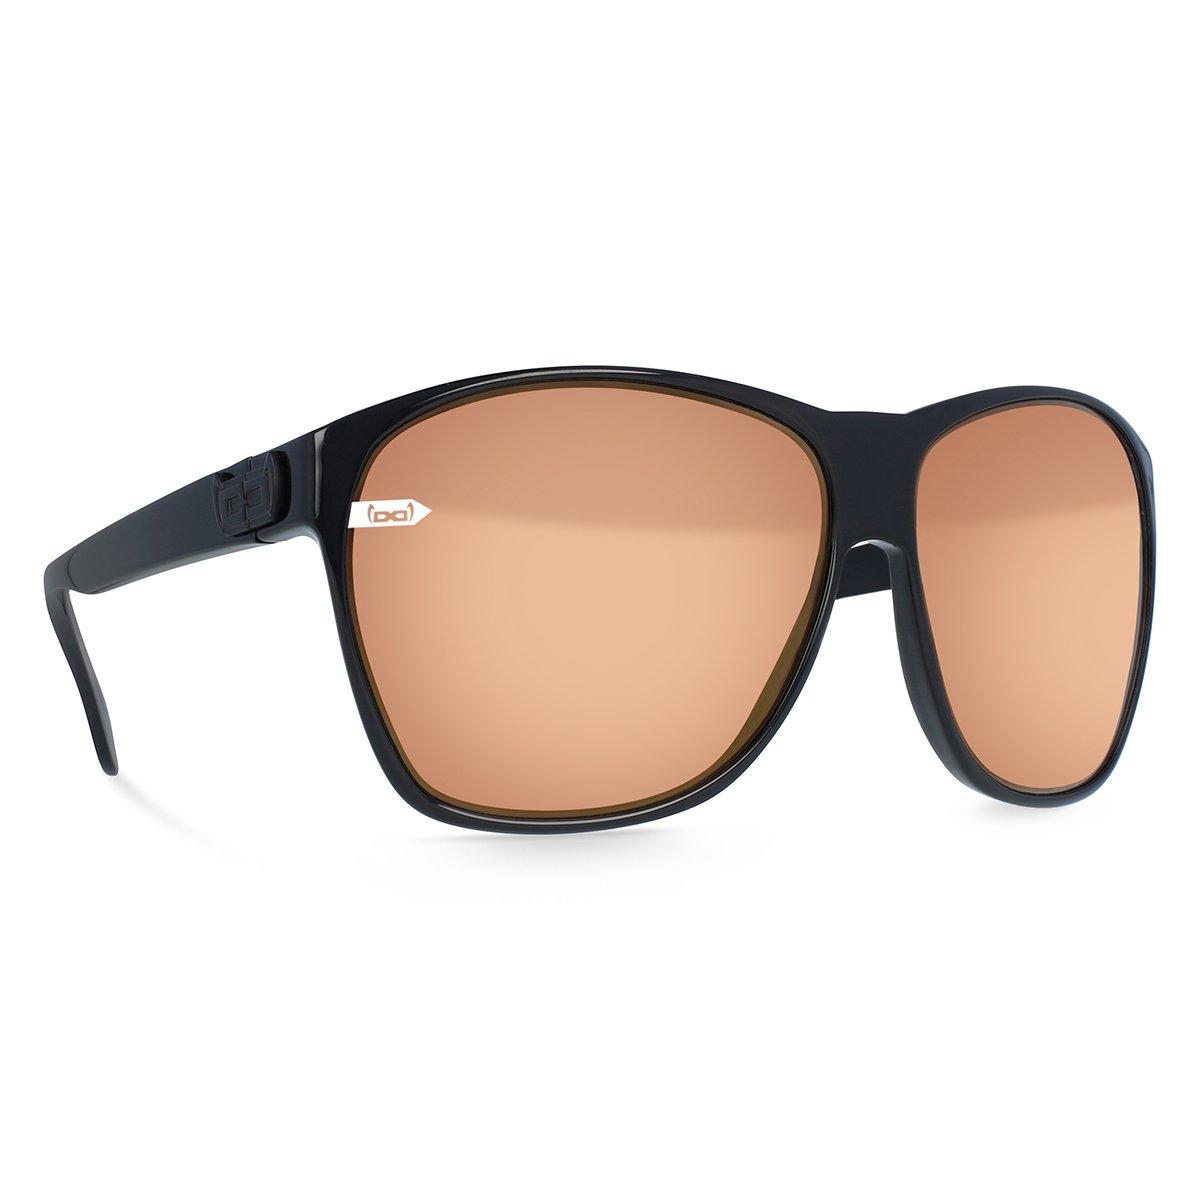 Gloryfy Unisex Gi7 JJ schwarz Sonnenbrille